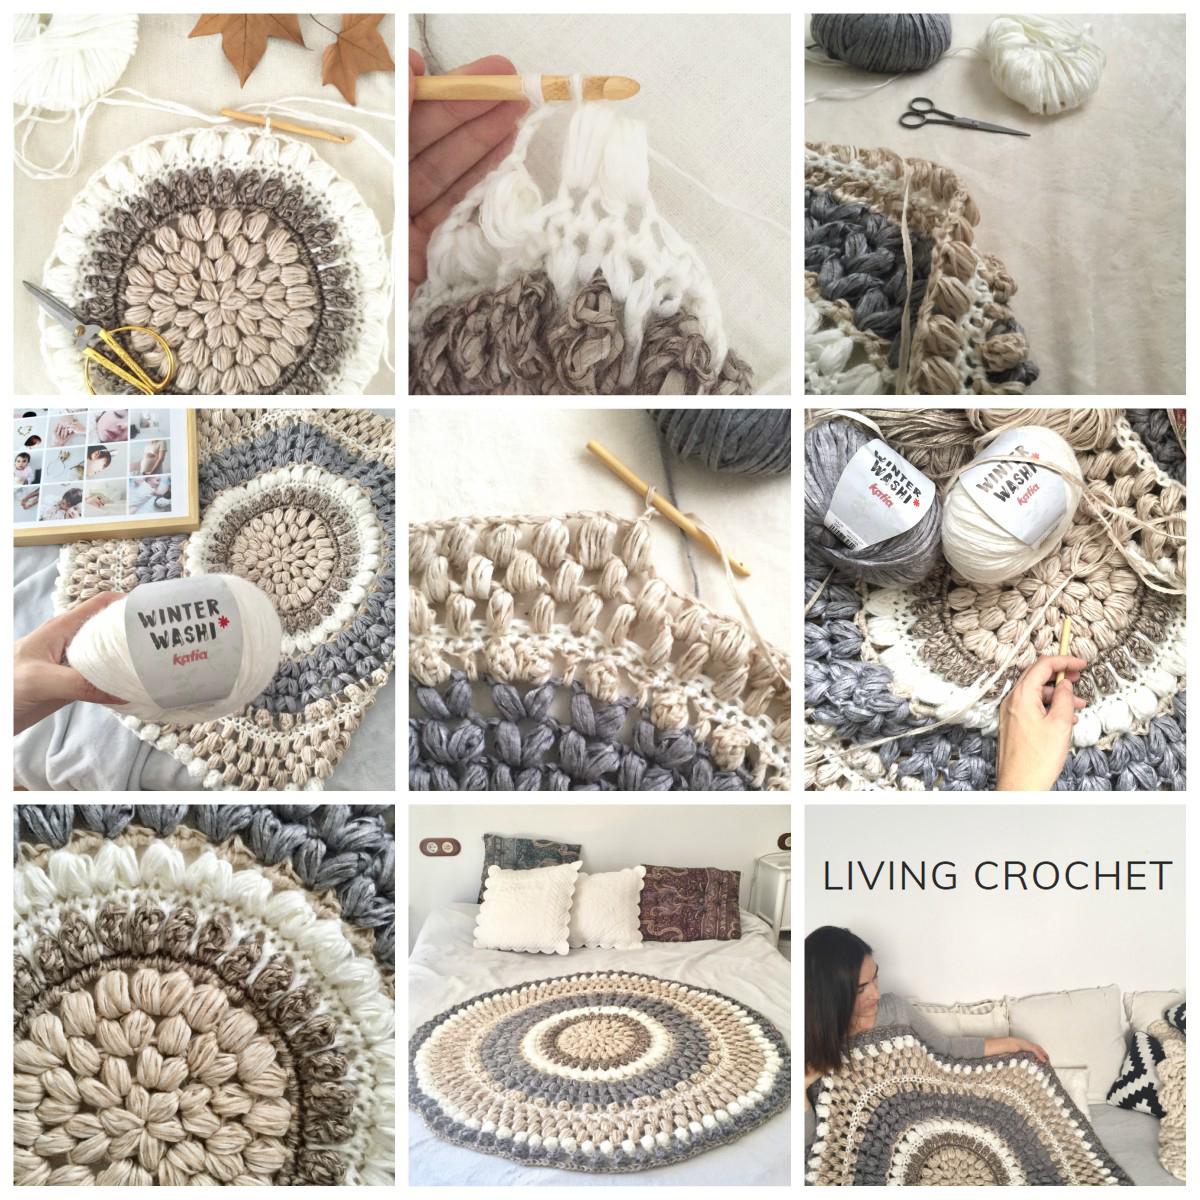 Monstrous amigurumi to crochet with Katia Washi this Halloween | 1200x1200